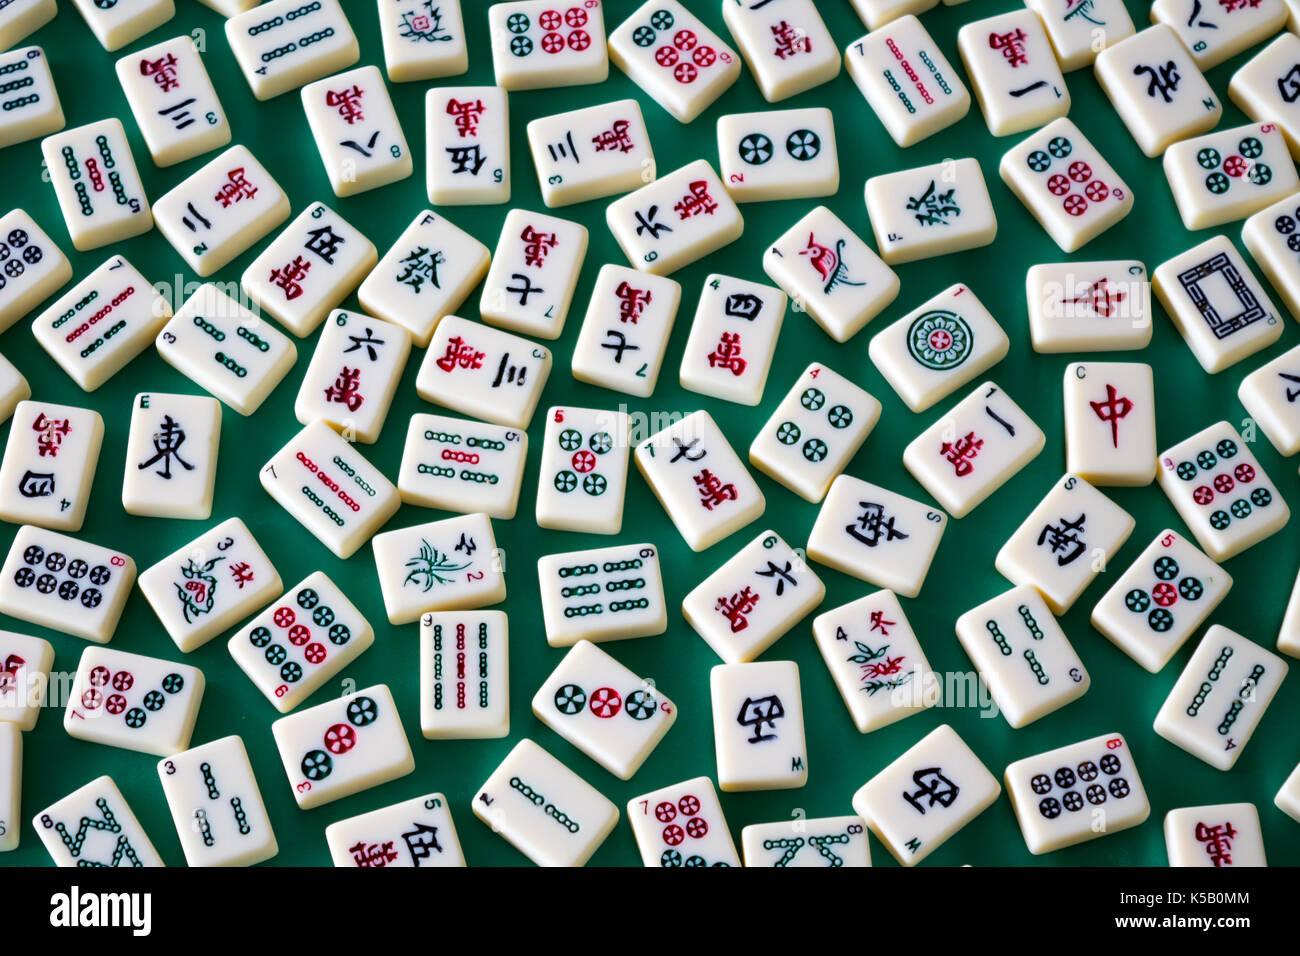 games mahjong tiles